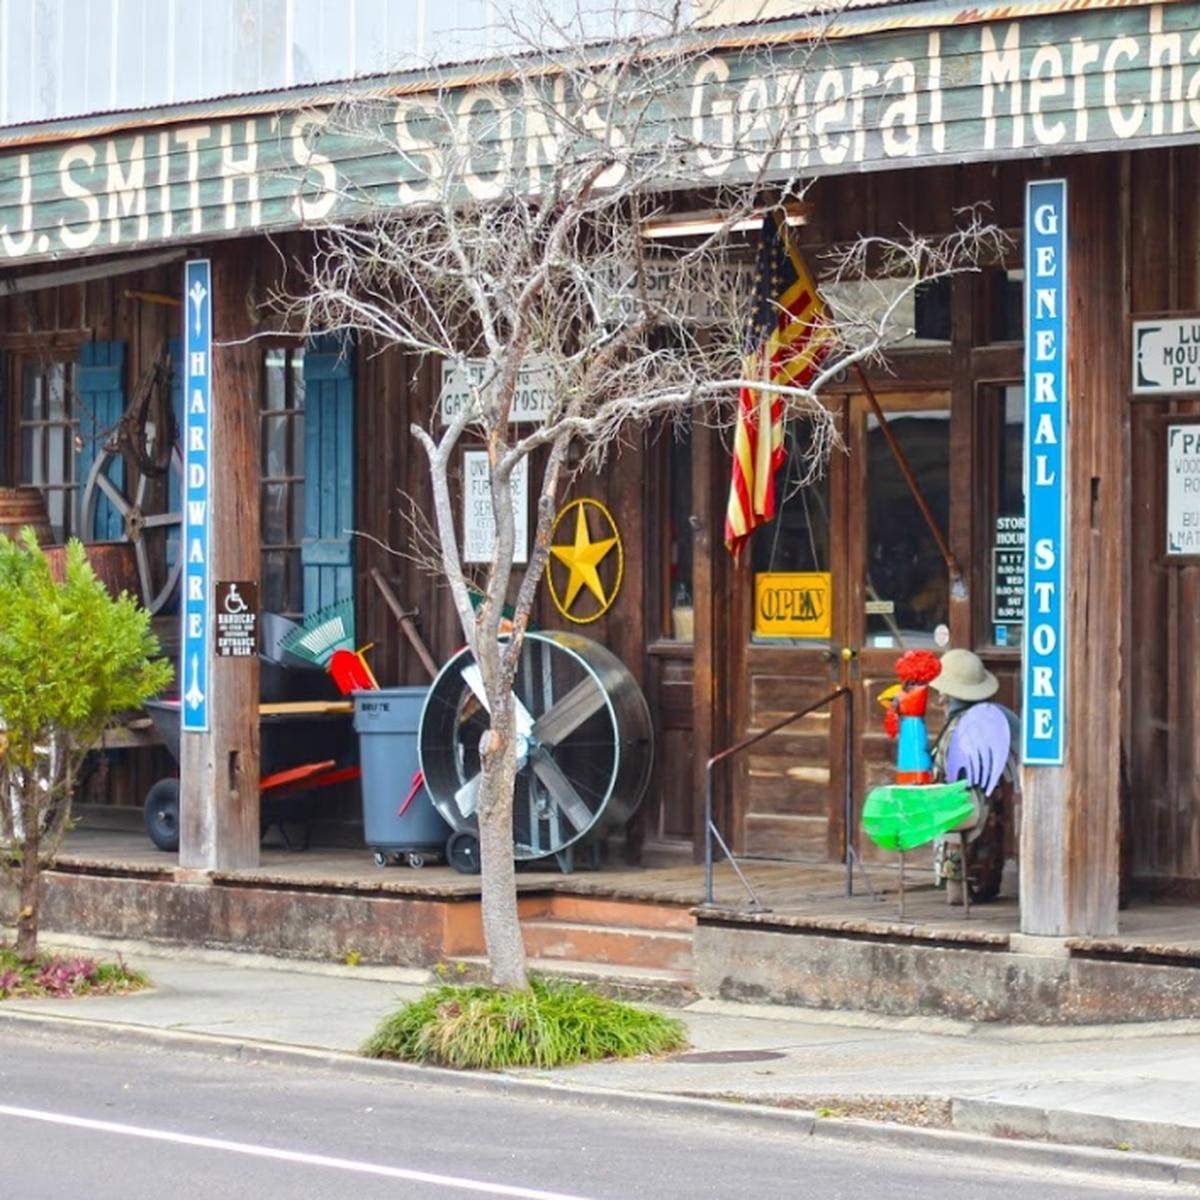 Heart of Louisiana: H.J. Smith and Sons Hardware Store